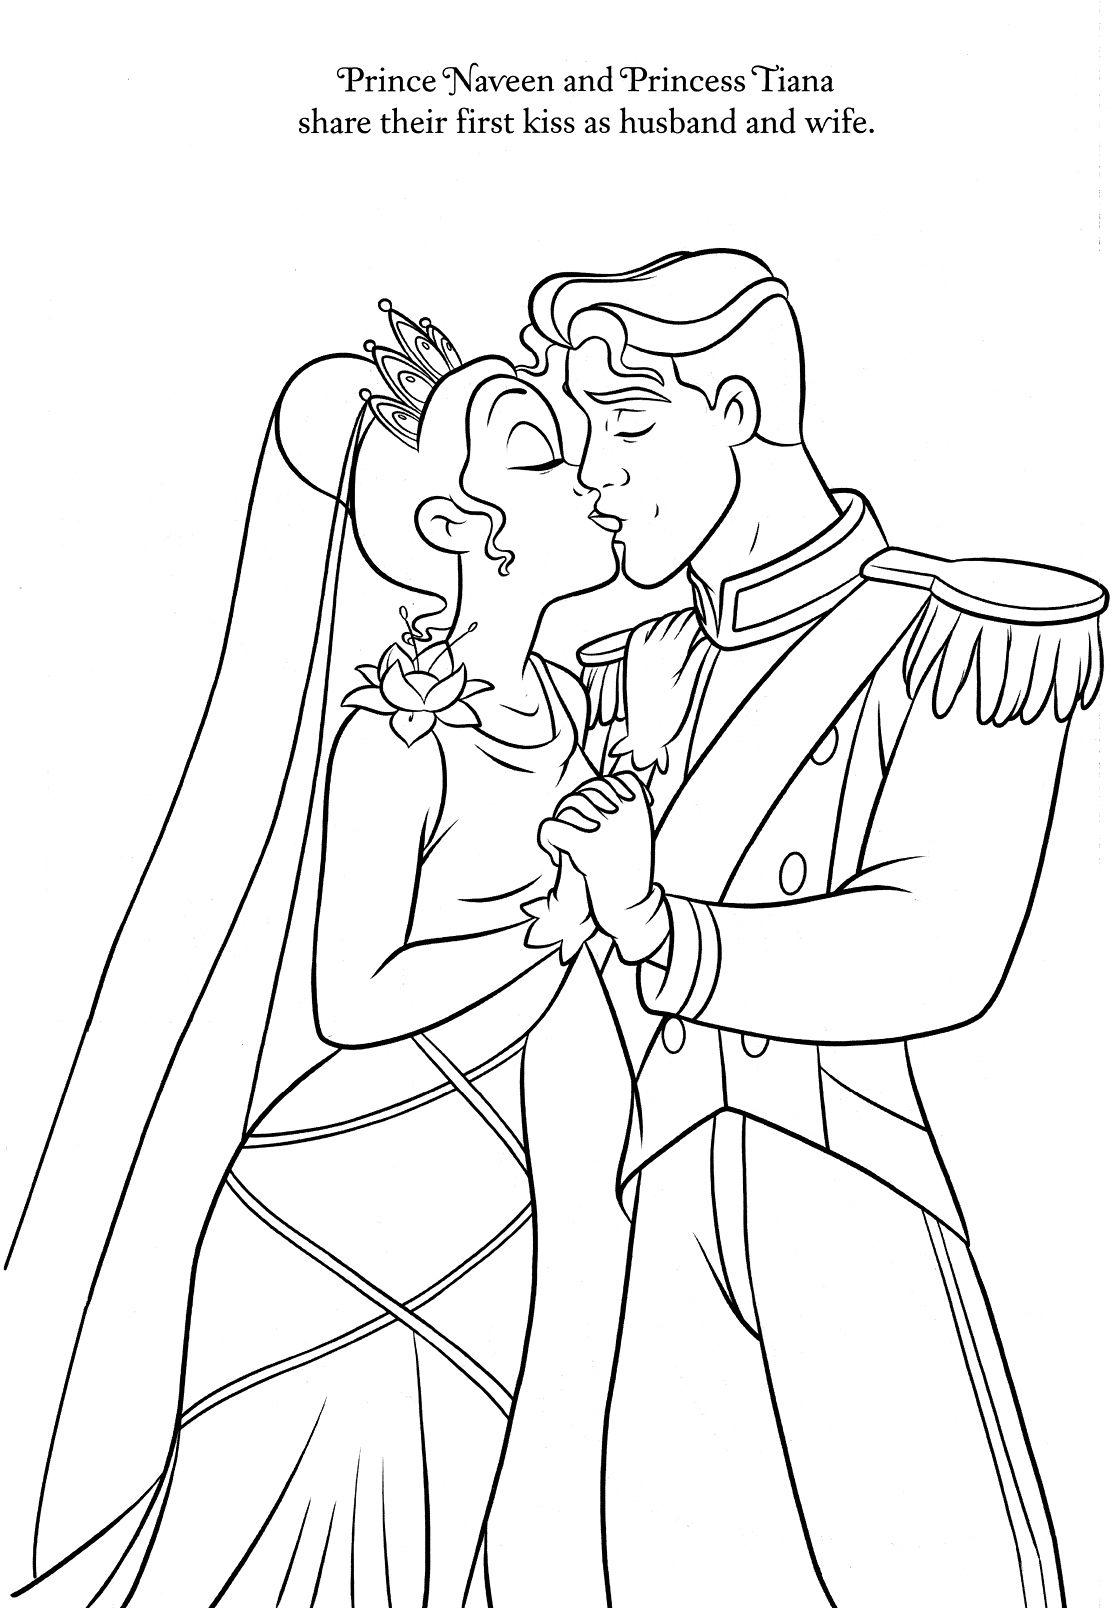 Tiana & Prince Naveen  Frog coloring pages, Princess coloring